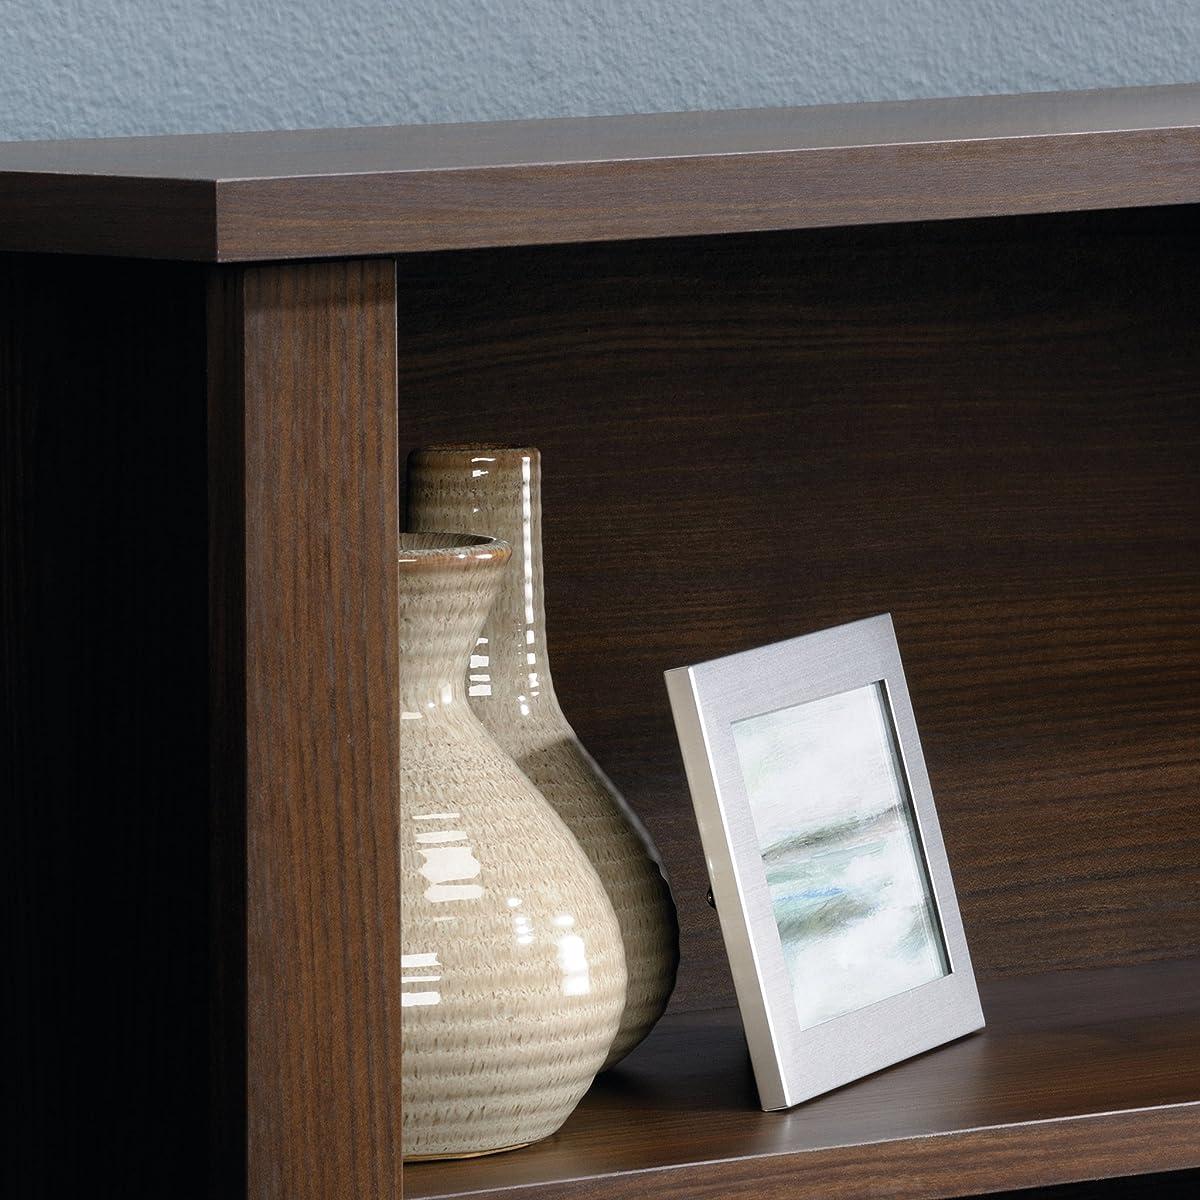 Sauder County Line Full/Queen Bookcase Headboard, Rum Walnut